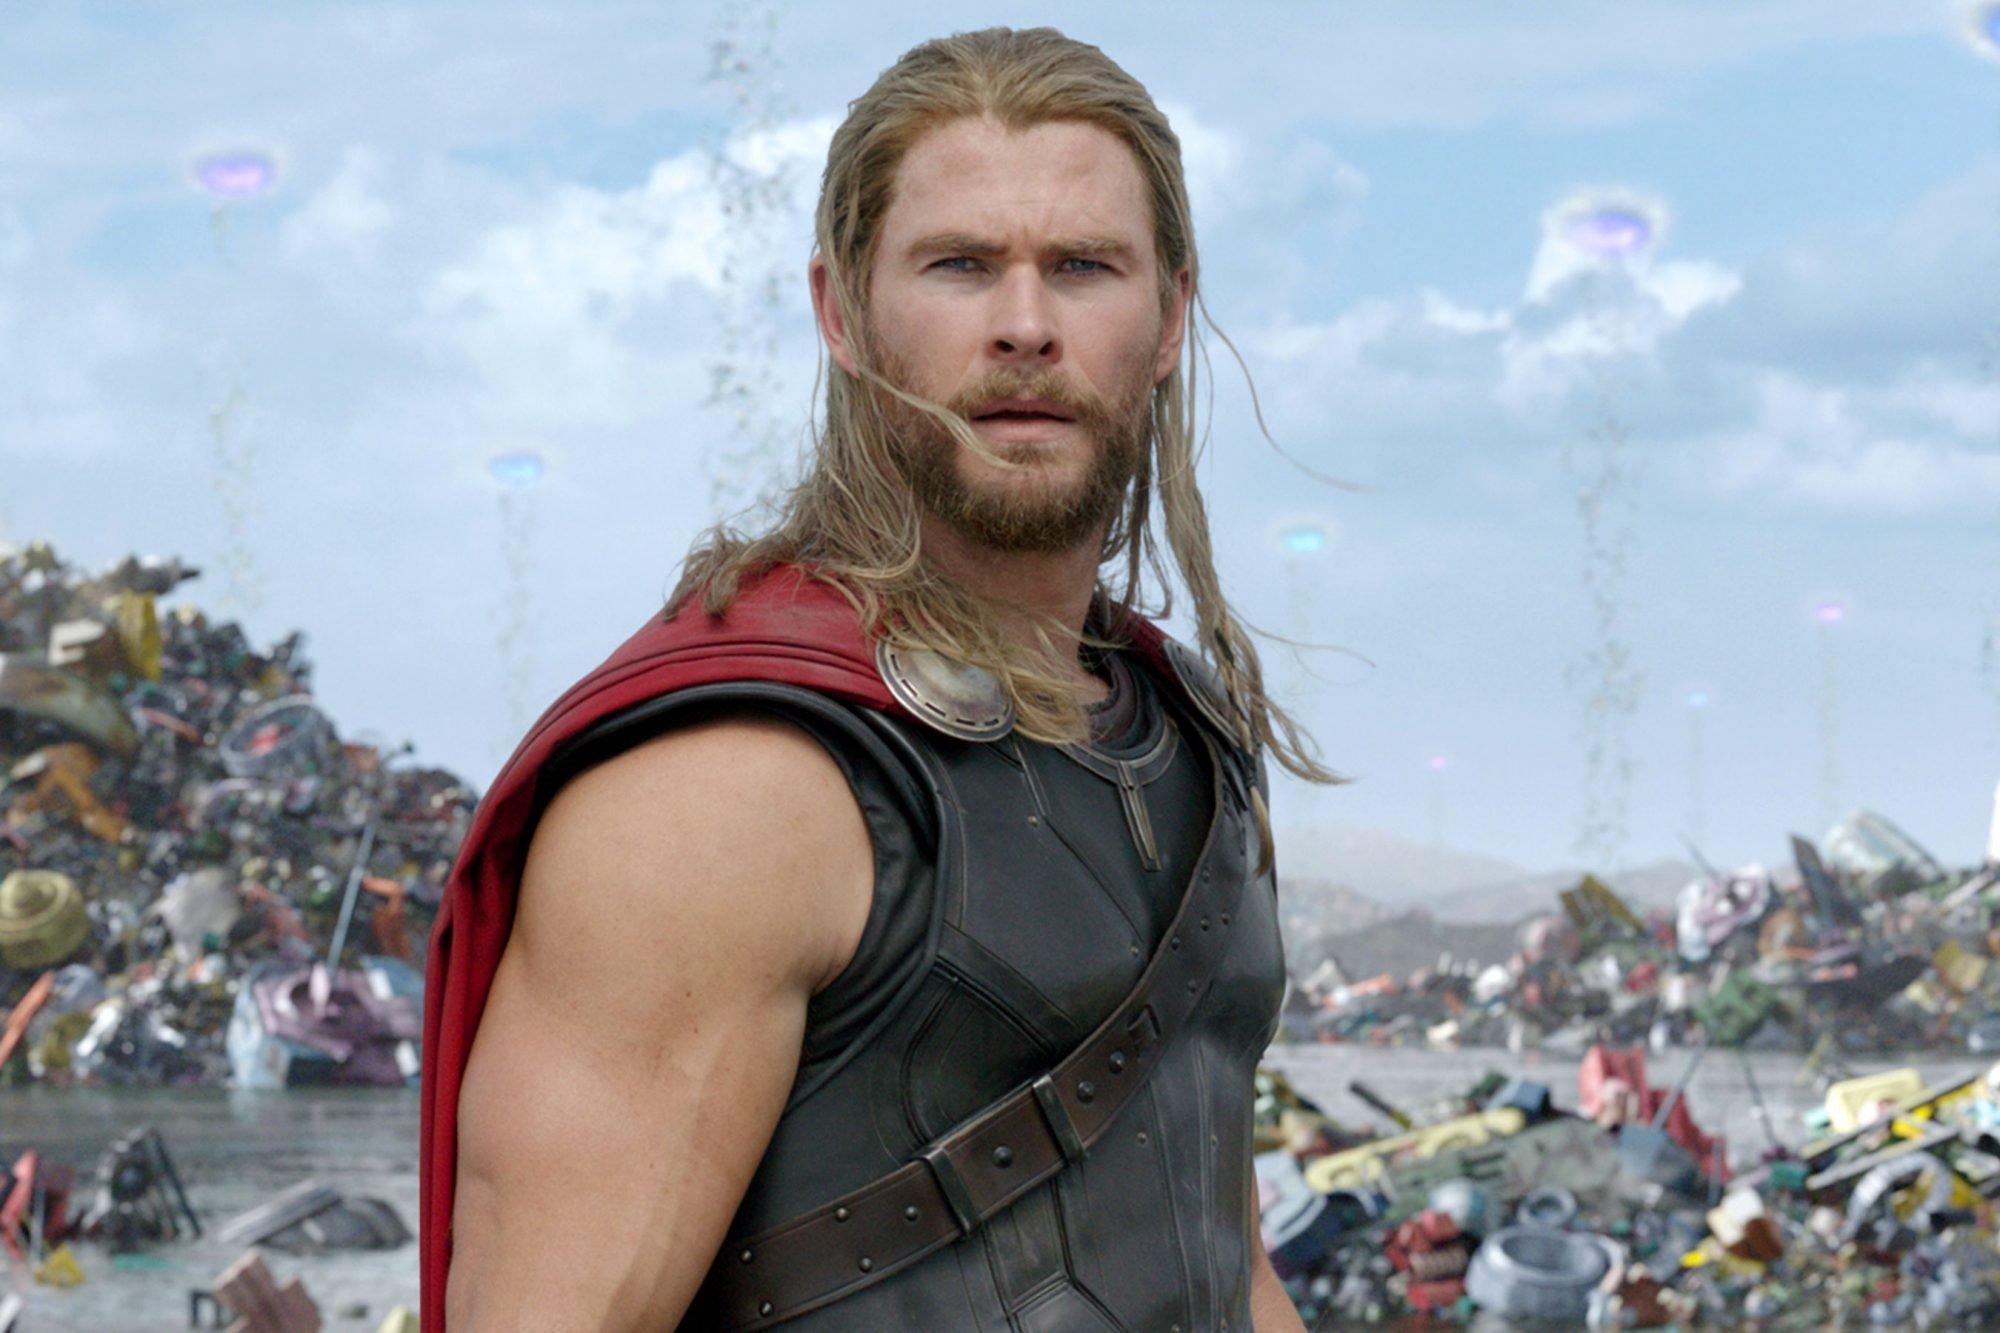 Chris Hemsworth Returning To Marvel As Frog Thor & More Marvel News - cover